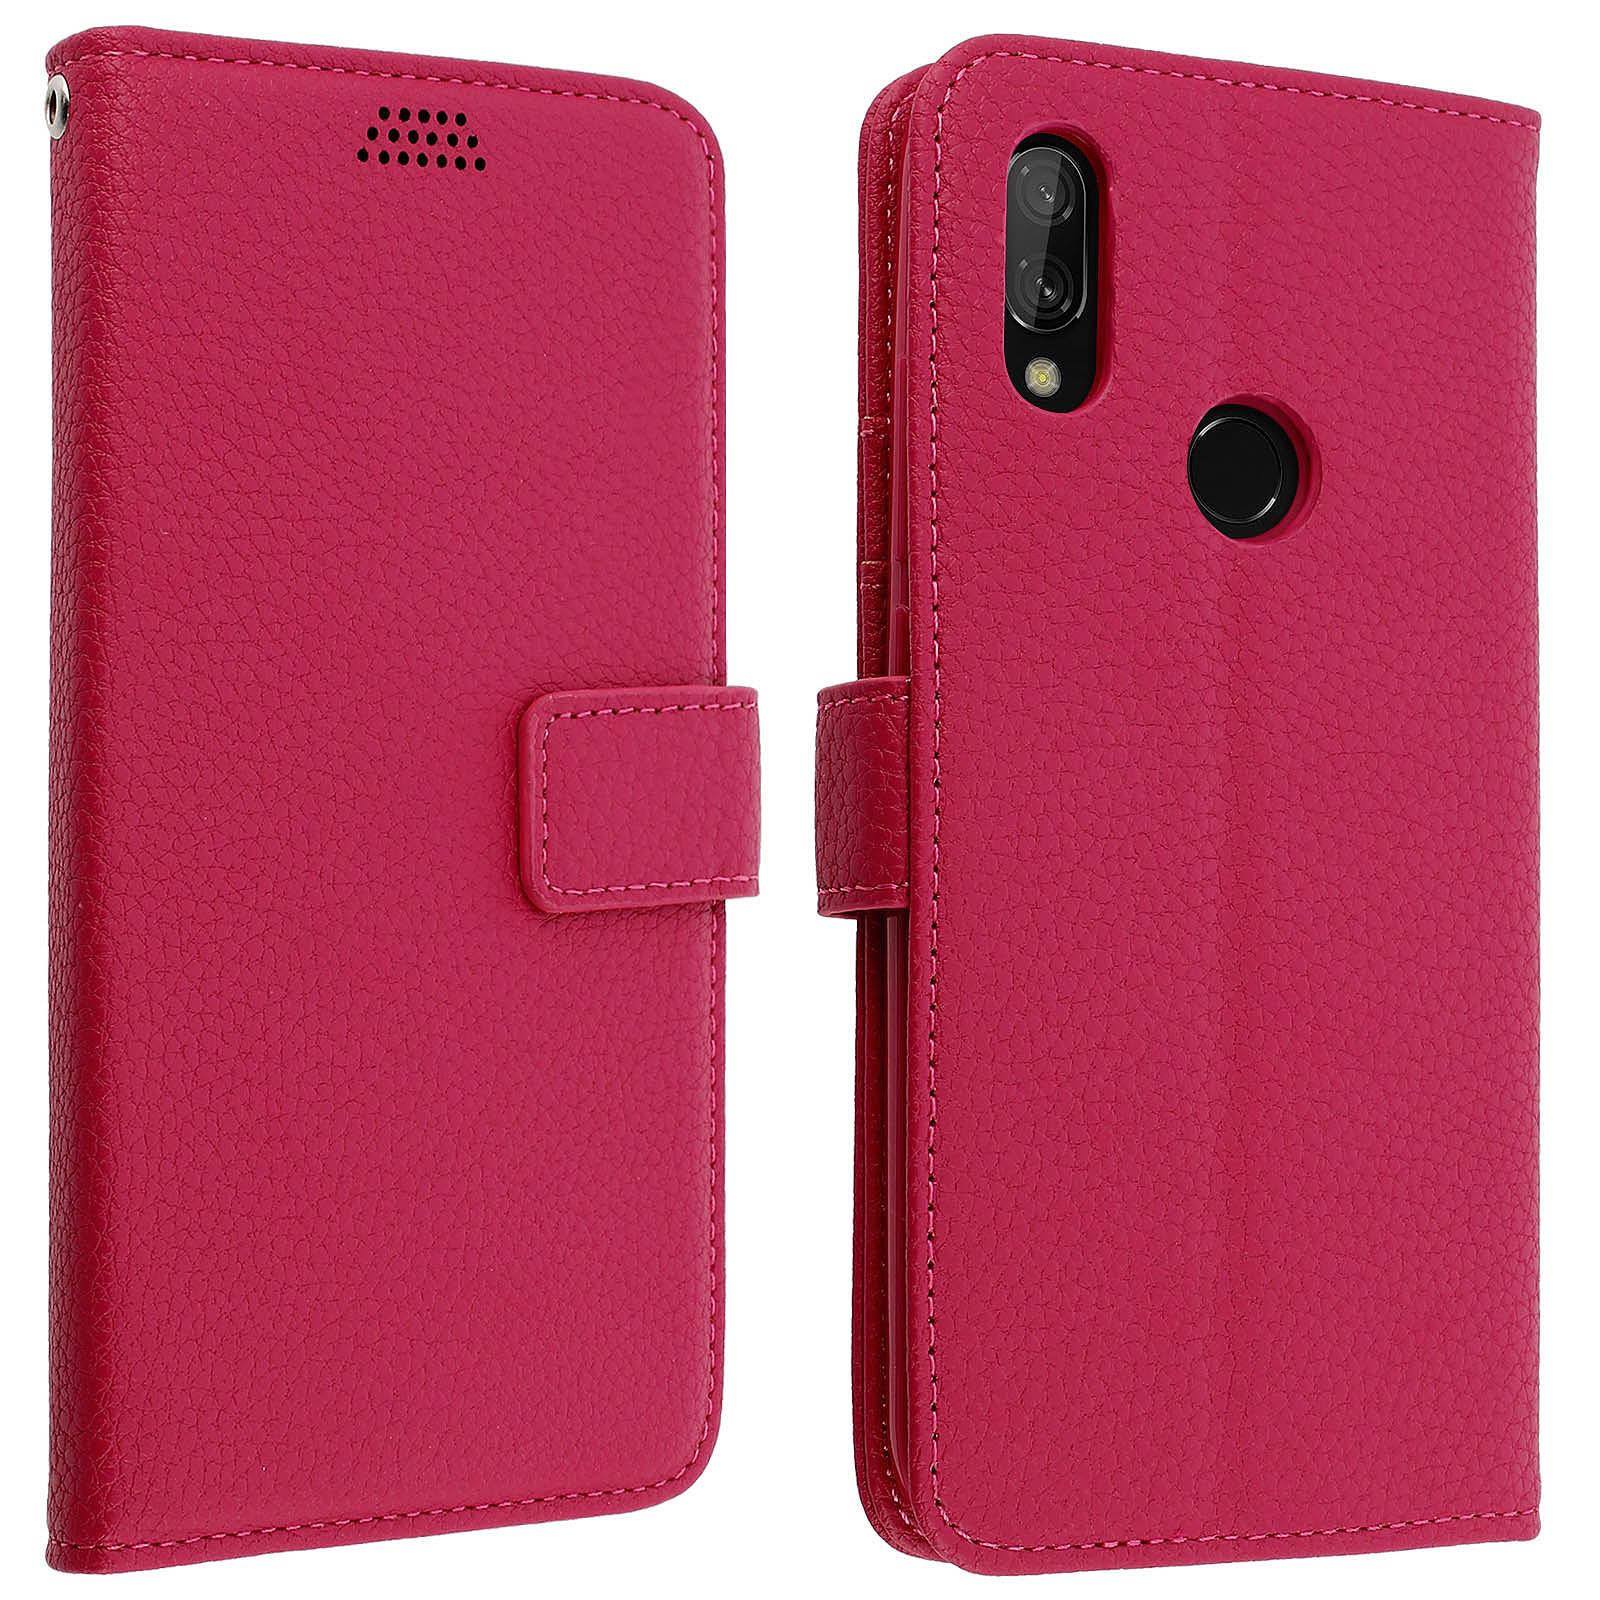 Avizar Etui folio Rose pour Xiaomi Redmi 7